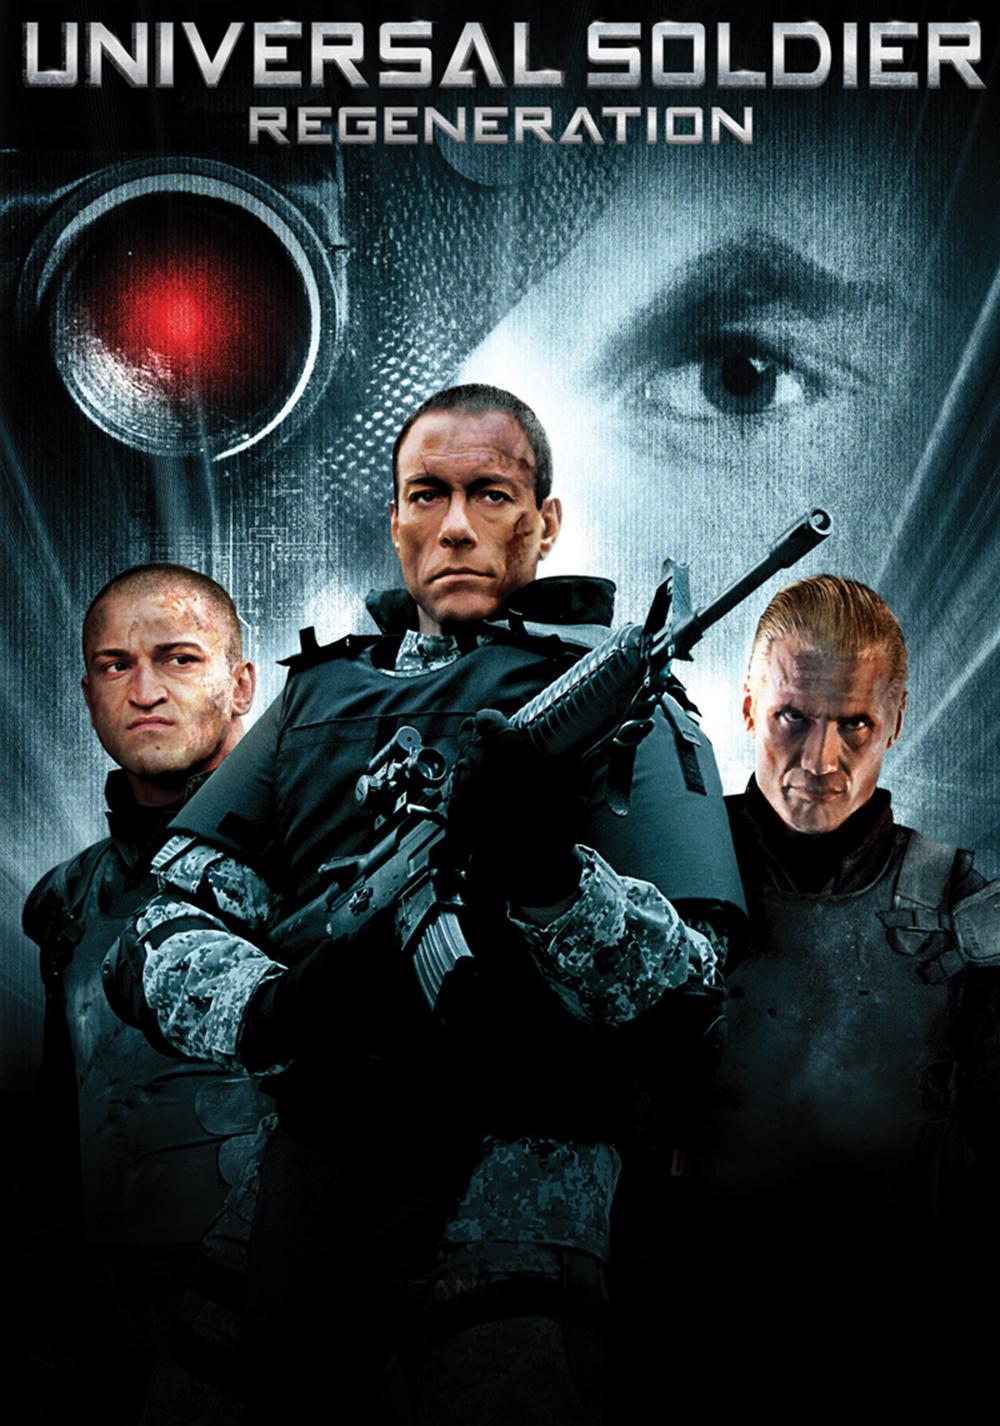 Universal Soldier Regeneration  Movie Fanart  Fanarttv-5303